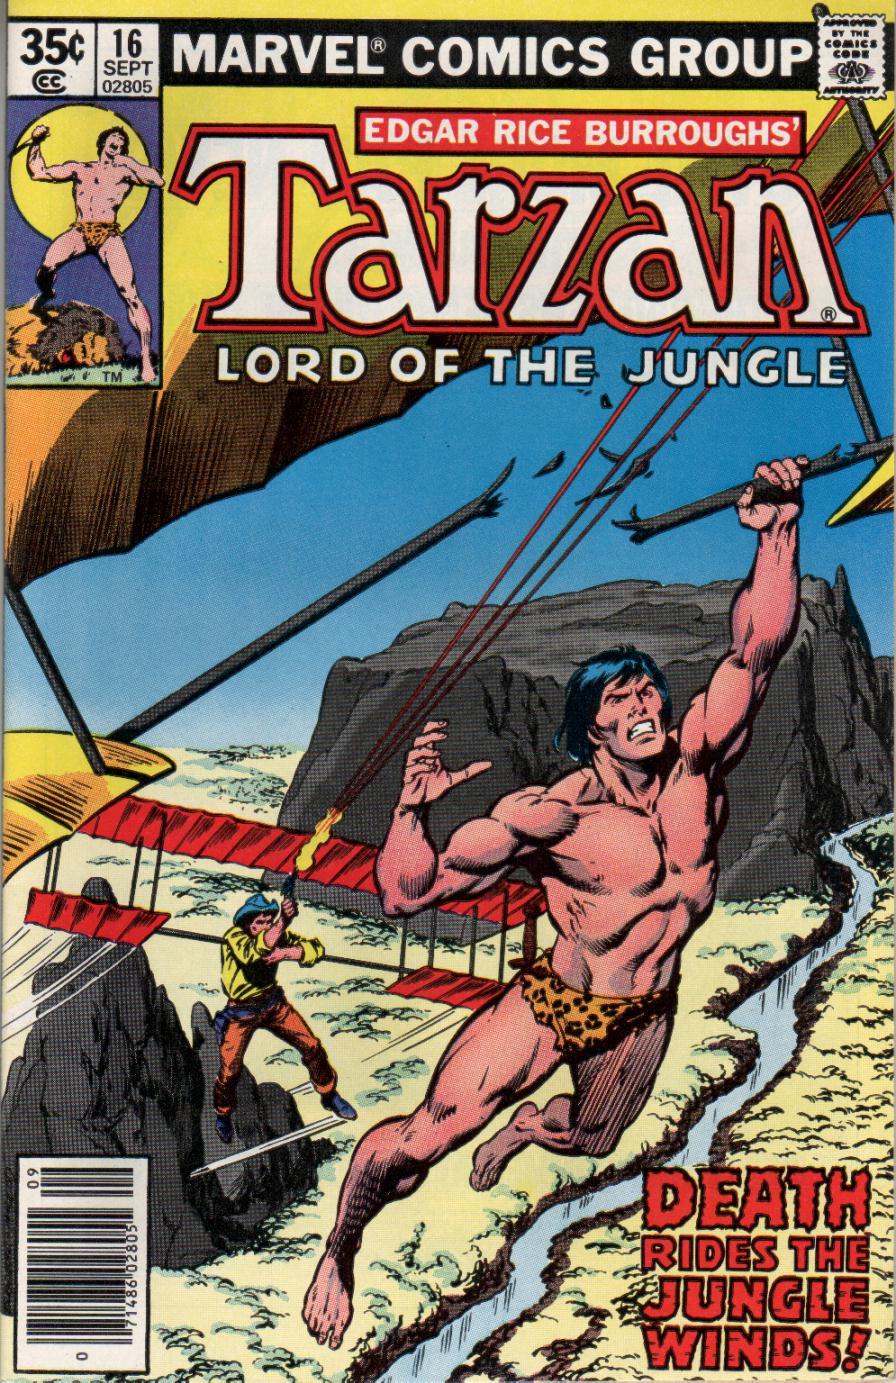 Tarzan (1977) #16, cover penciled by John Buscema & inked by Bob McLeod.